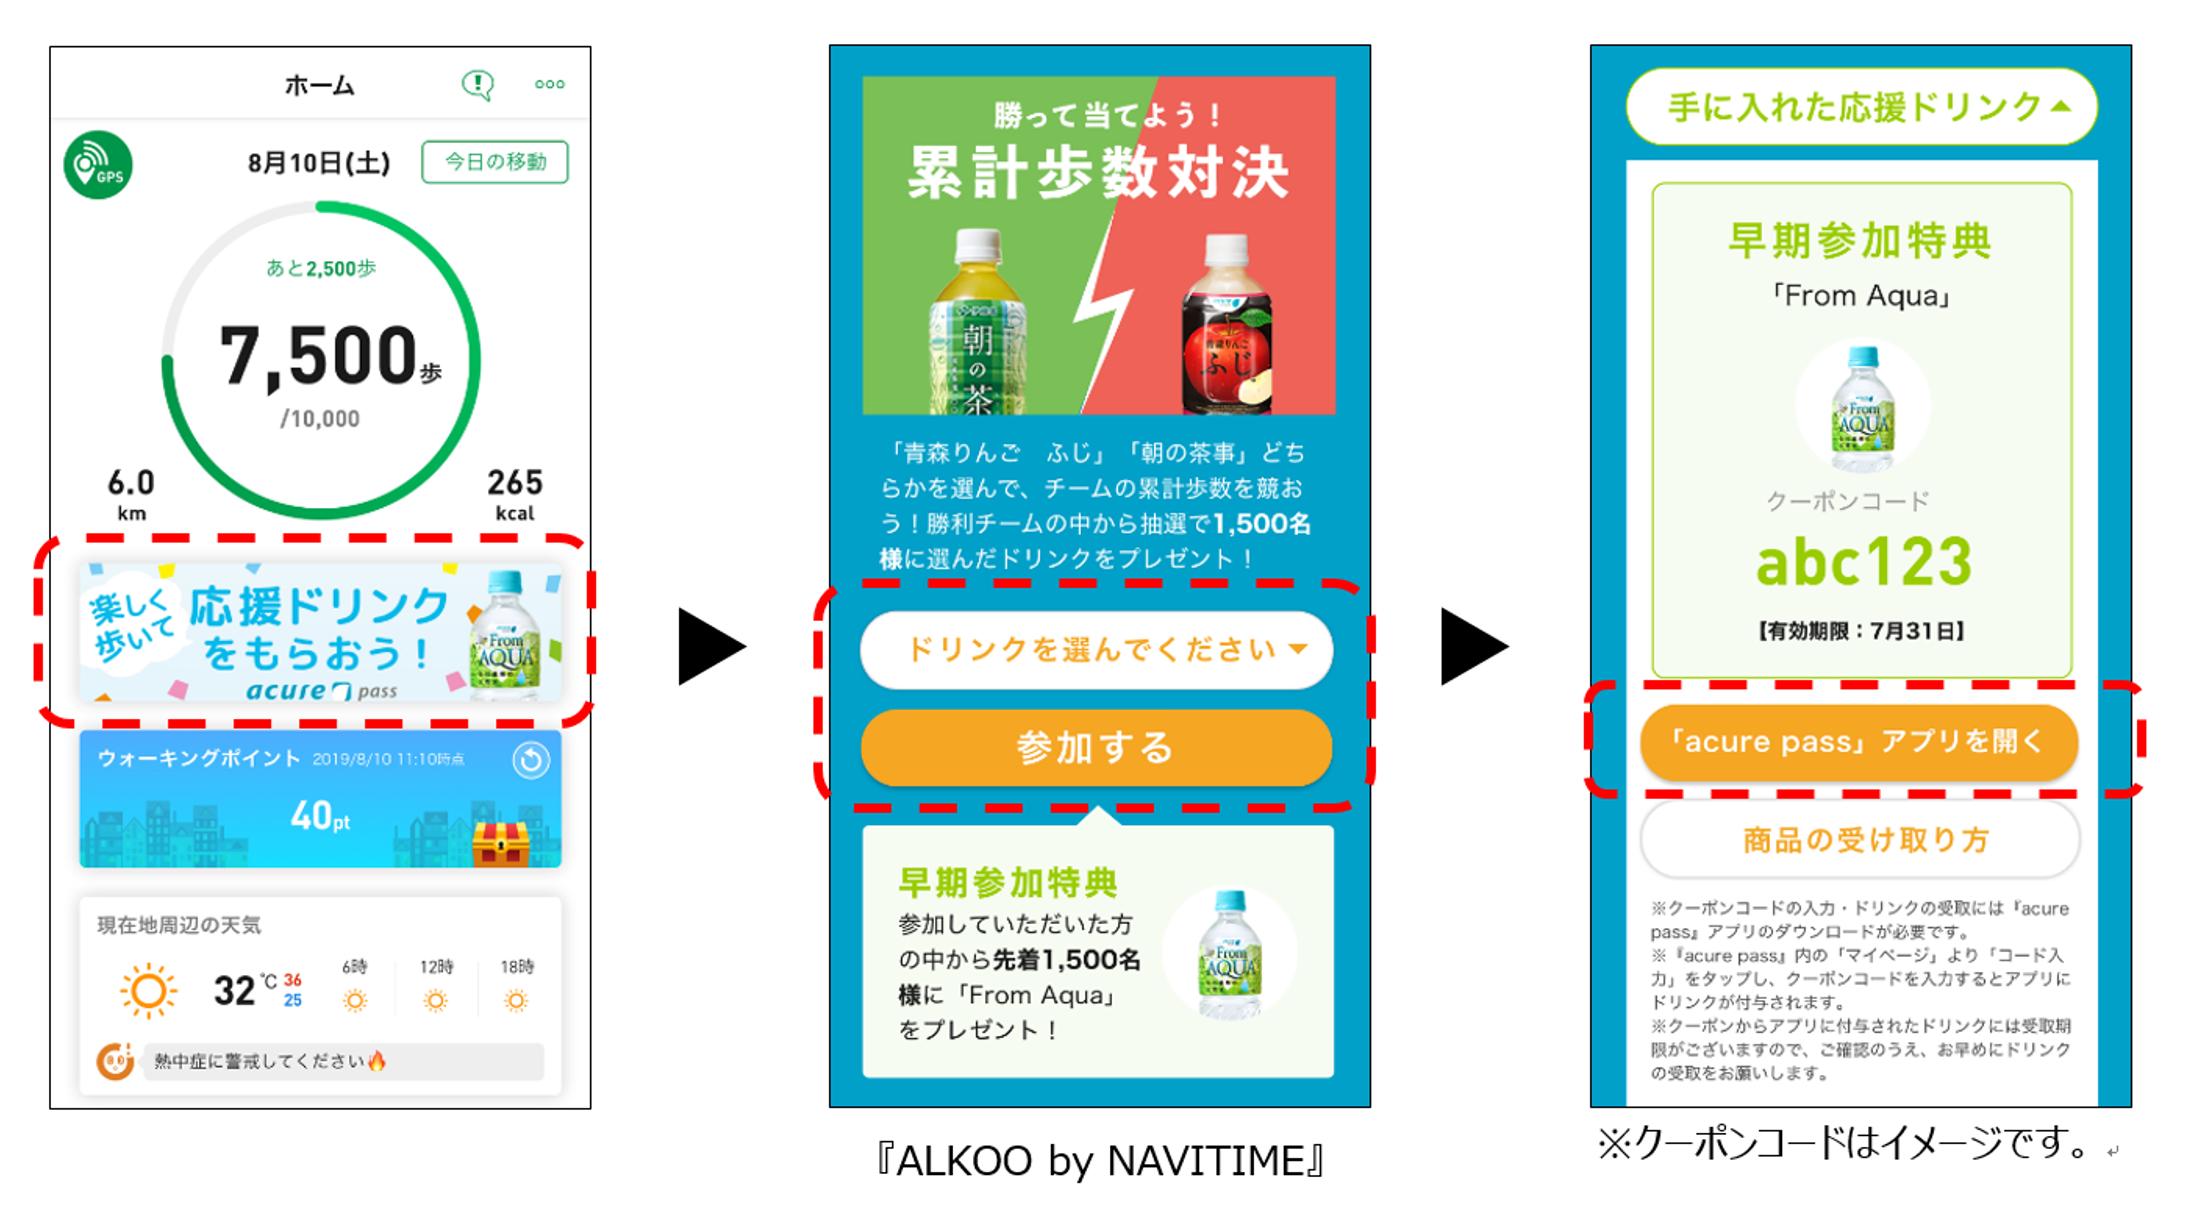 http://corporate.navitime.co.jp/topics/44165f20e64431b313b78cd87b34d3afac78f204.png